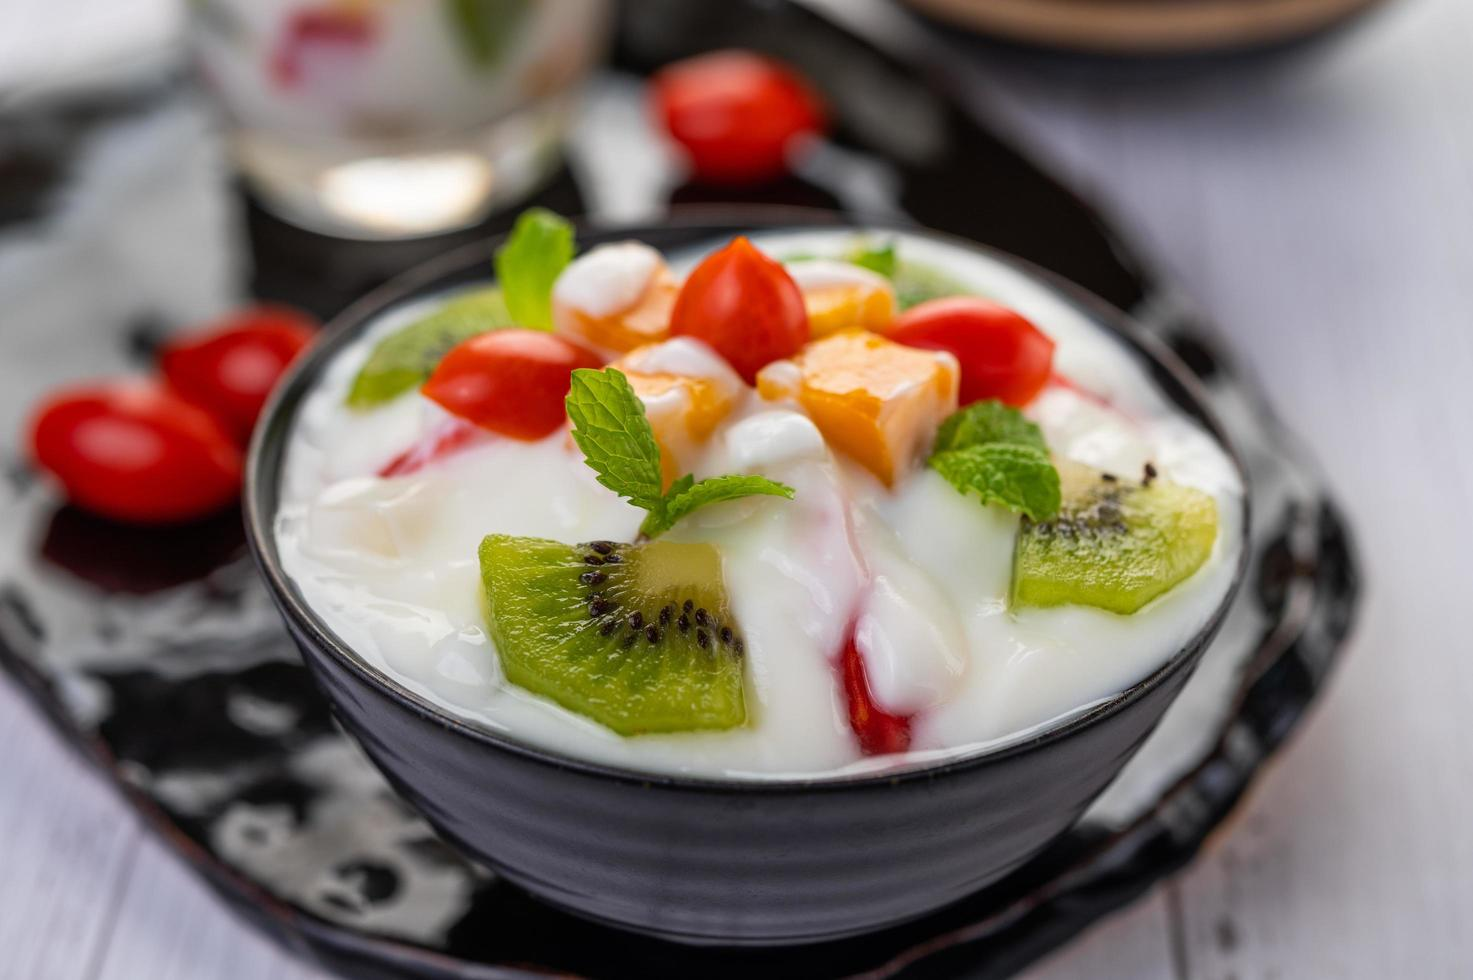 fruktsallad i en yoghurtskål foto